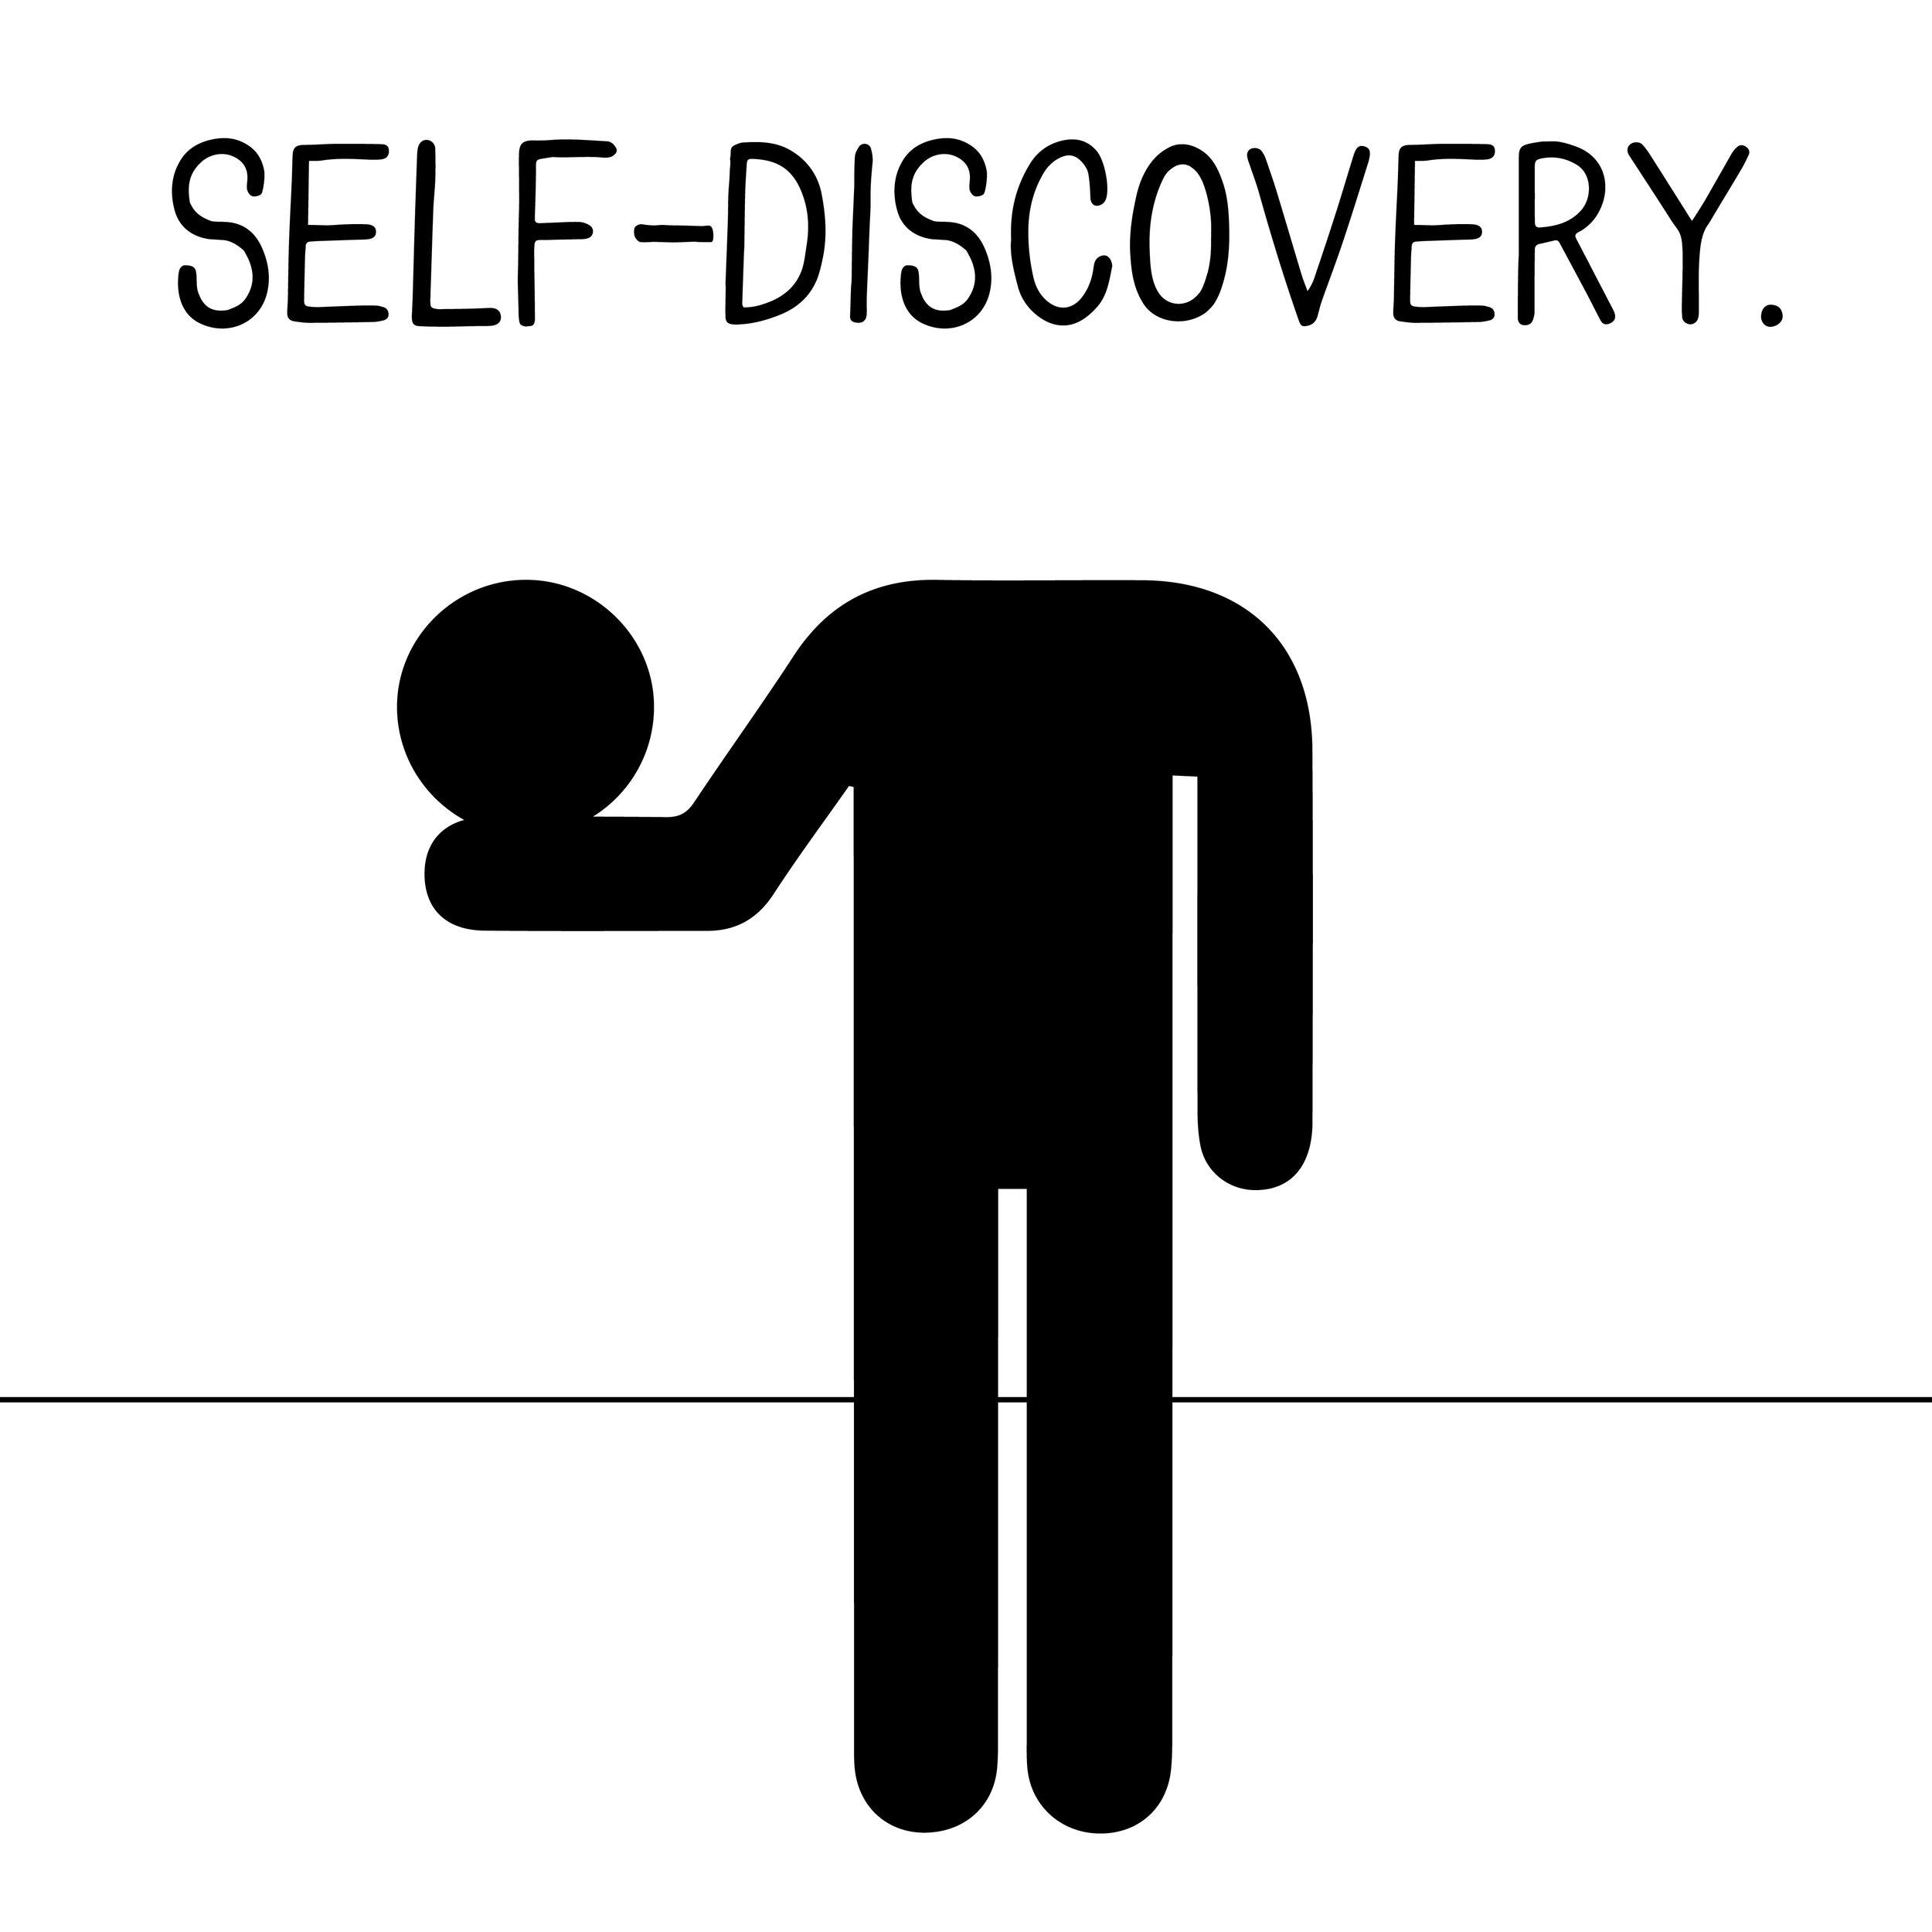 selfdiscovery-01.jpg